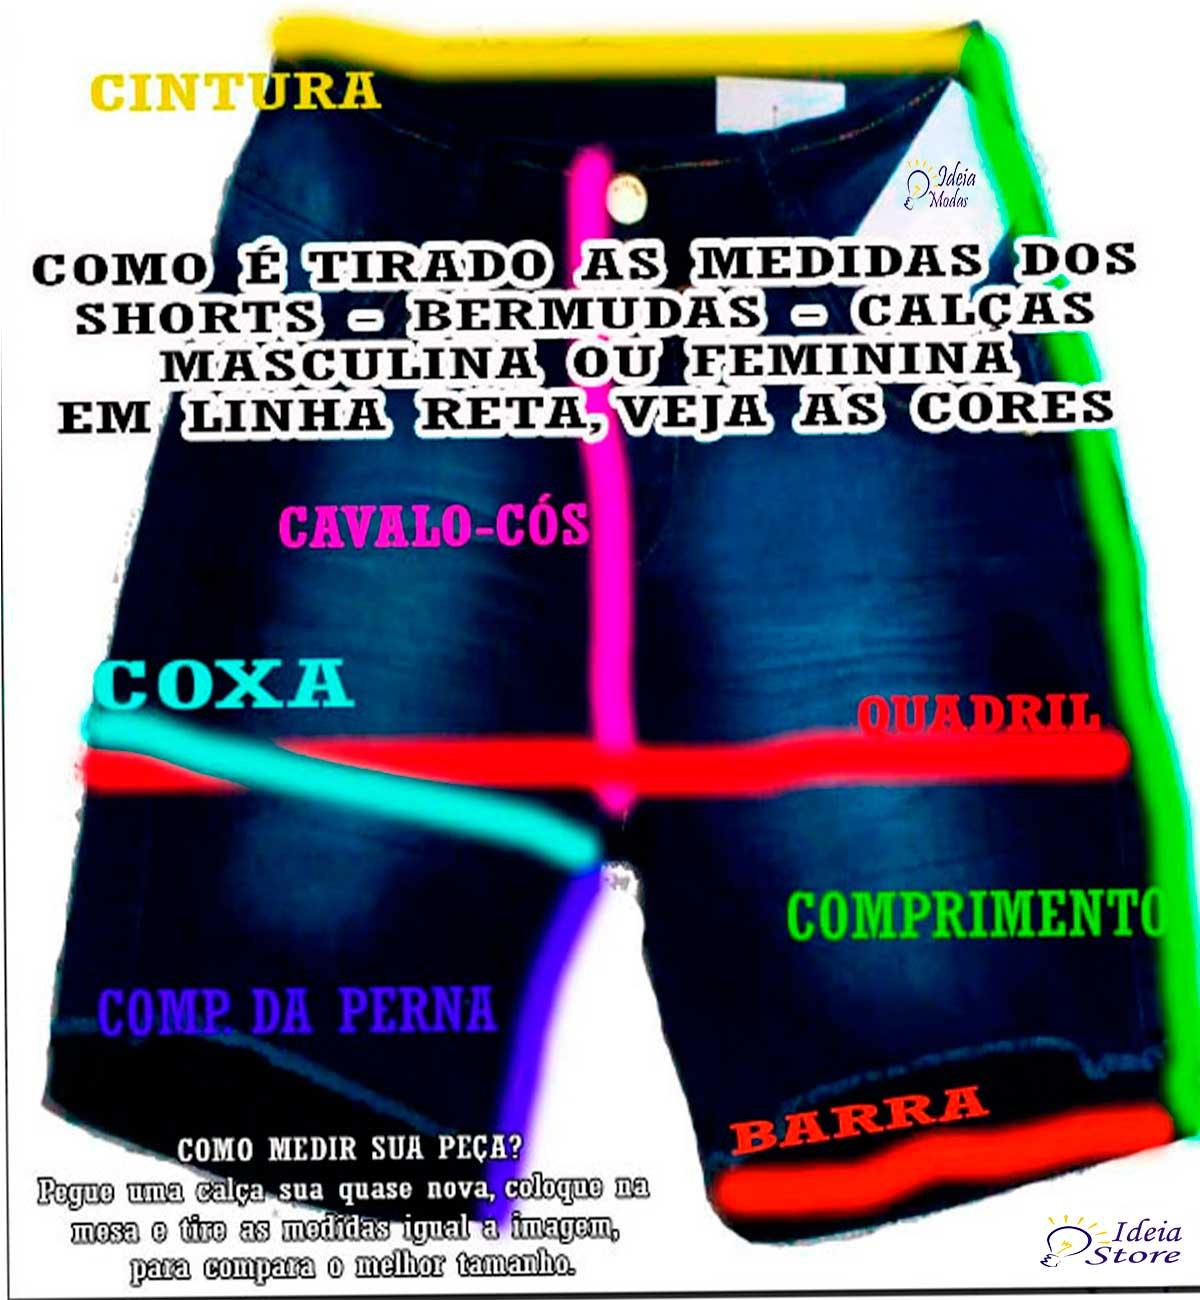 Calça Masculina Jeans skinny com elastano